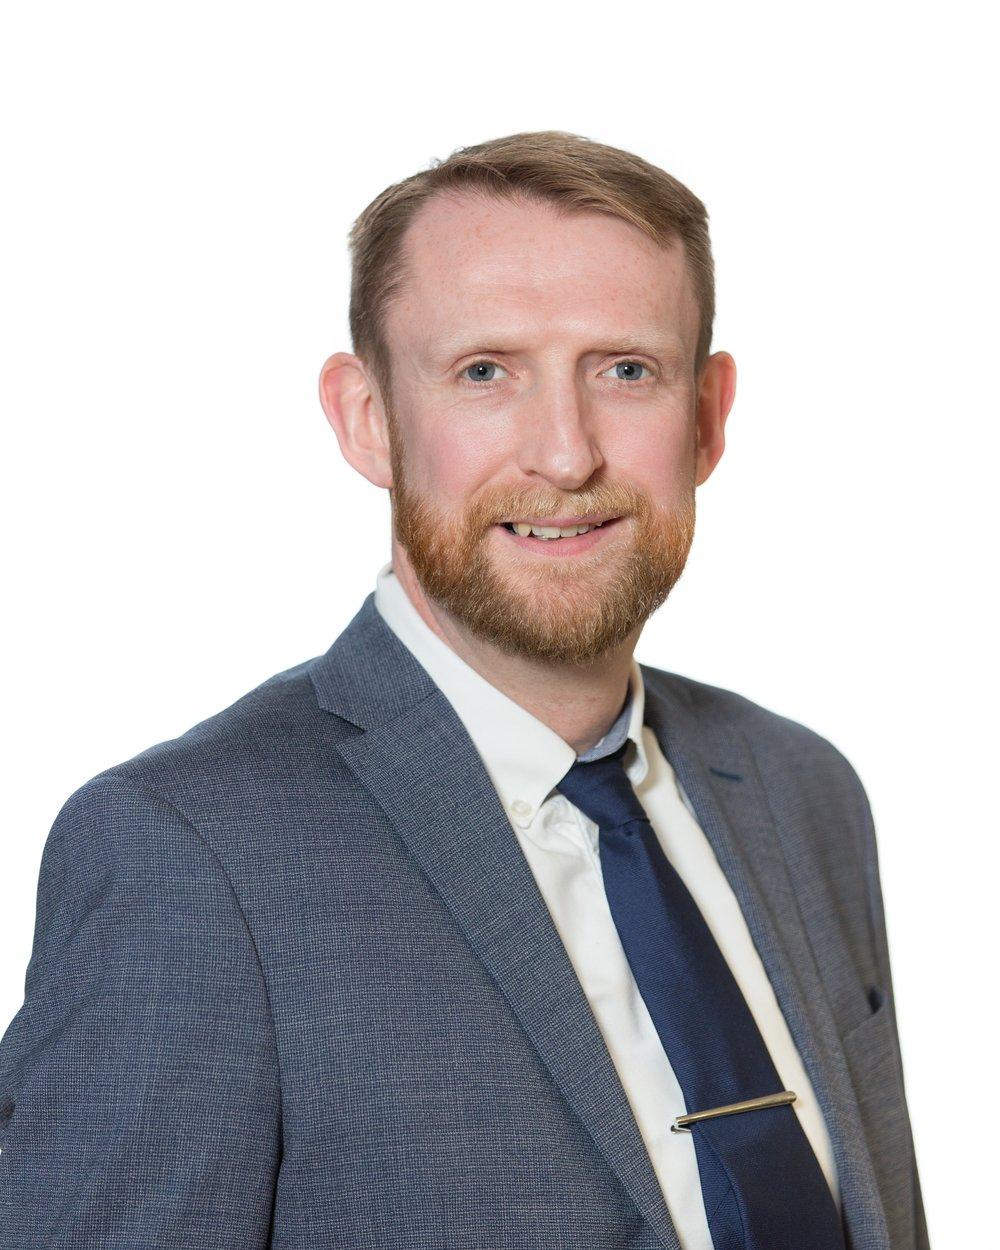 FIONN O'BRIEN - PROJECT ENGINEER